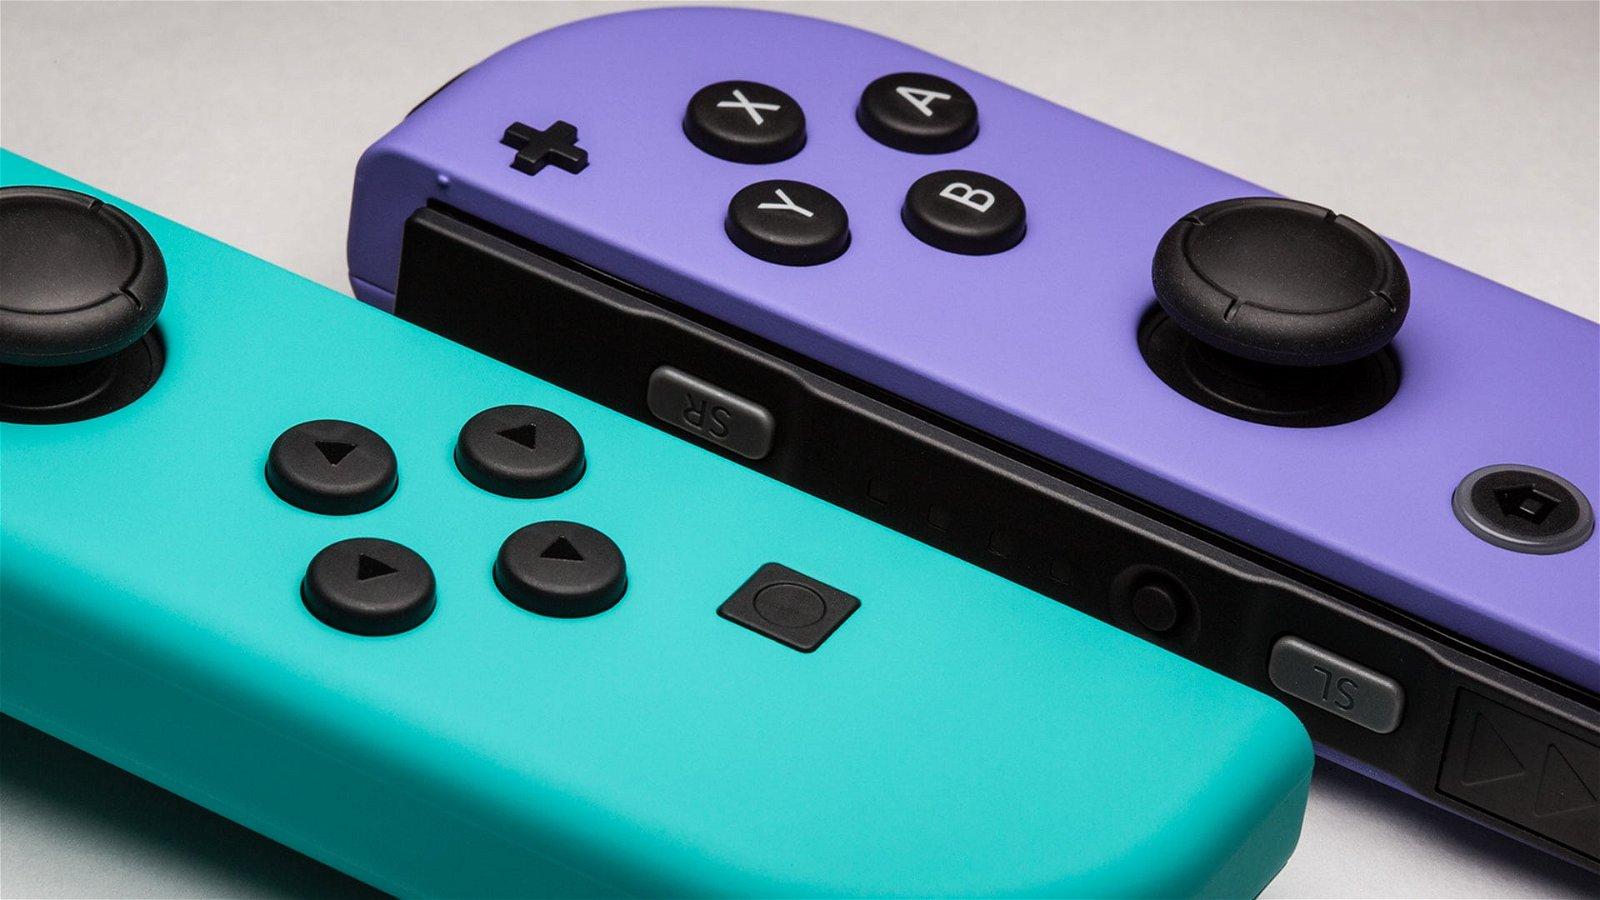 "Switch ""Joy-Con Drift"" Addressed in Public Apology by Nintendo President"